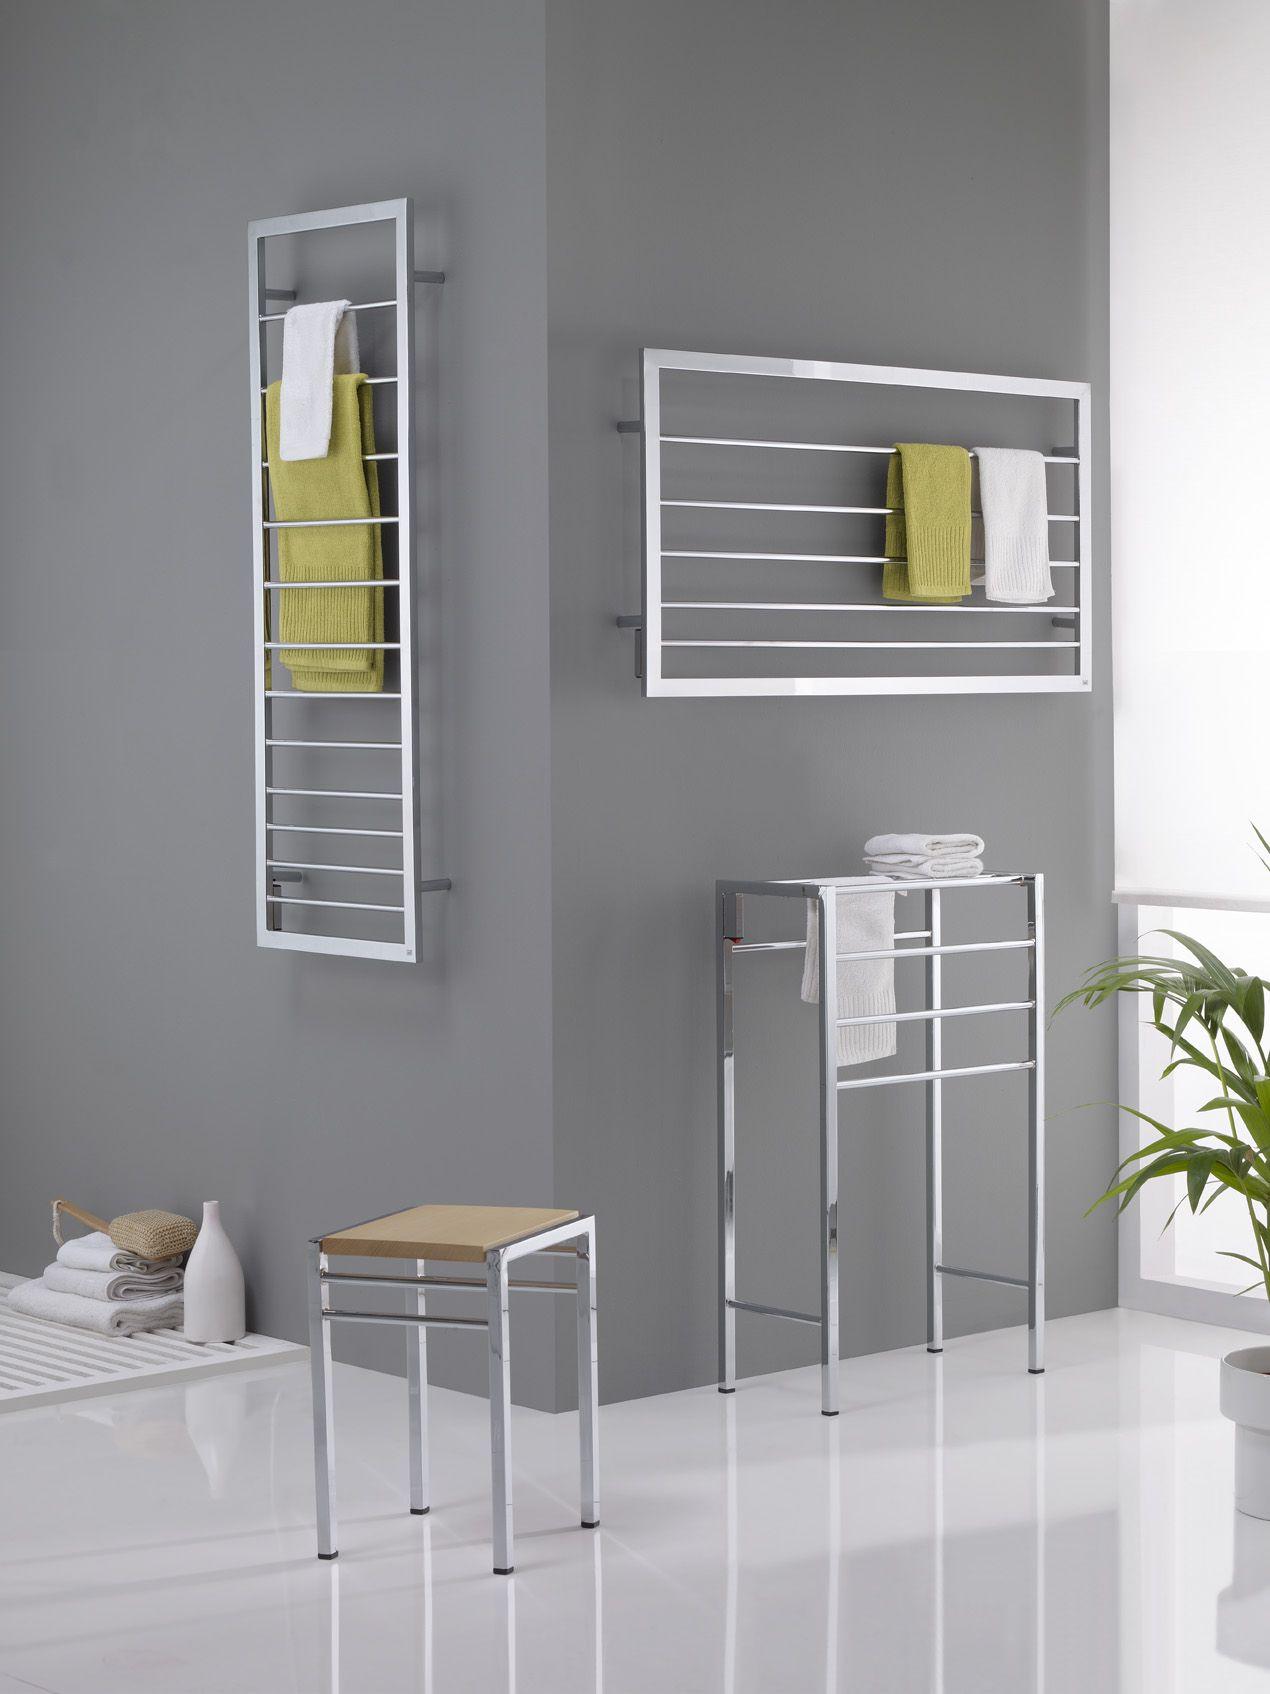 Oxil marc radiadores radiators pinterest toallero - Radiador electrico bano ...